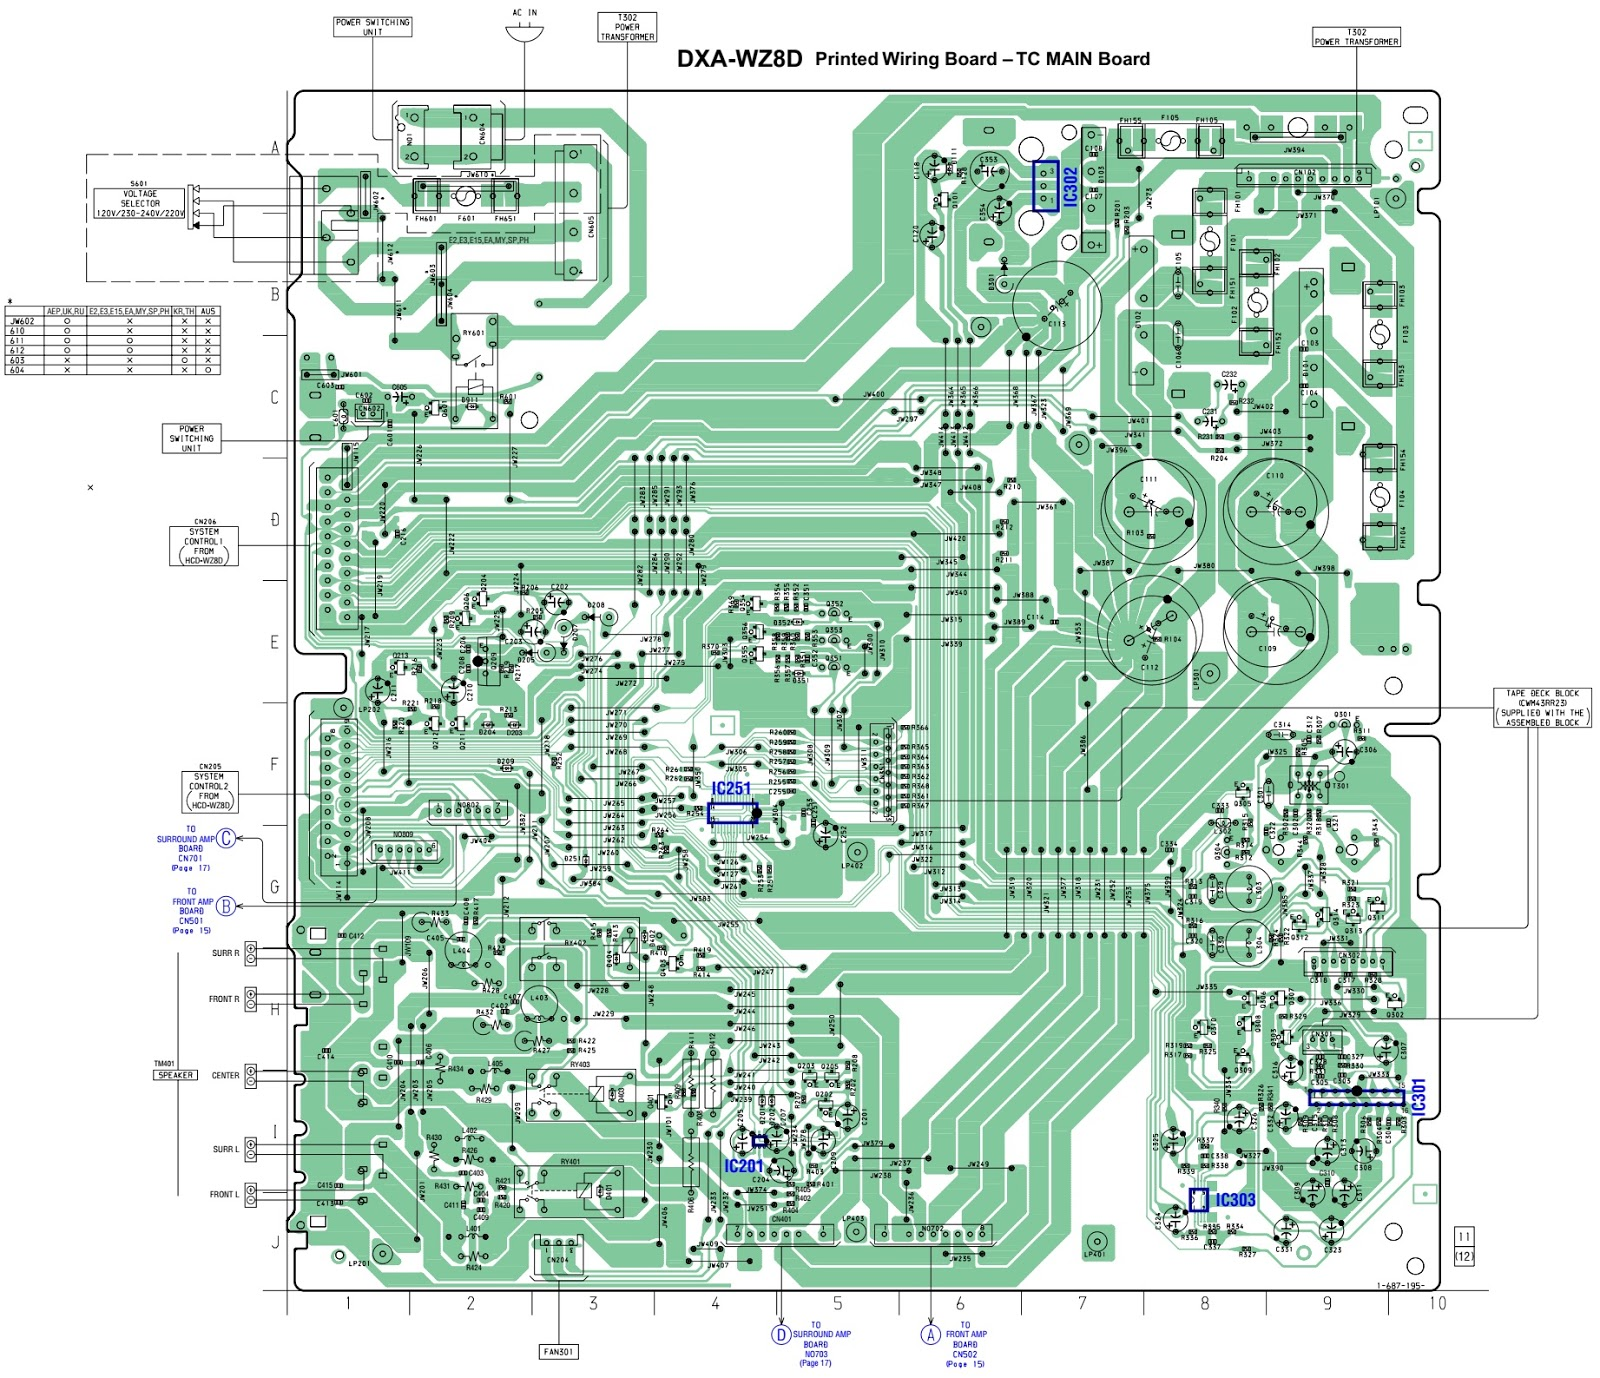 medium resolution of sony dxa wz8d main board circuit diagram 1of 2